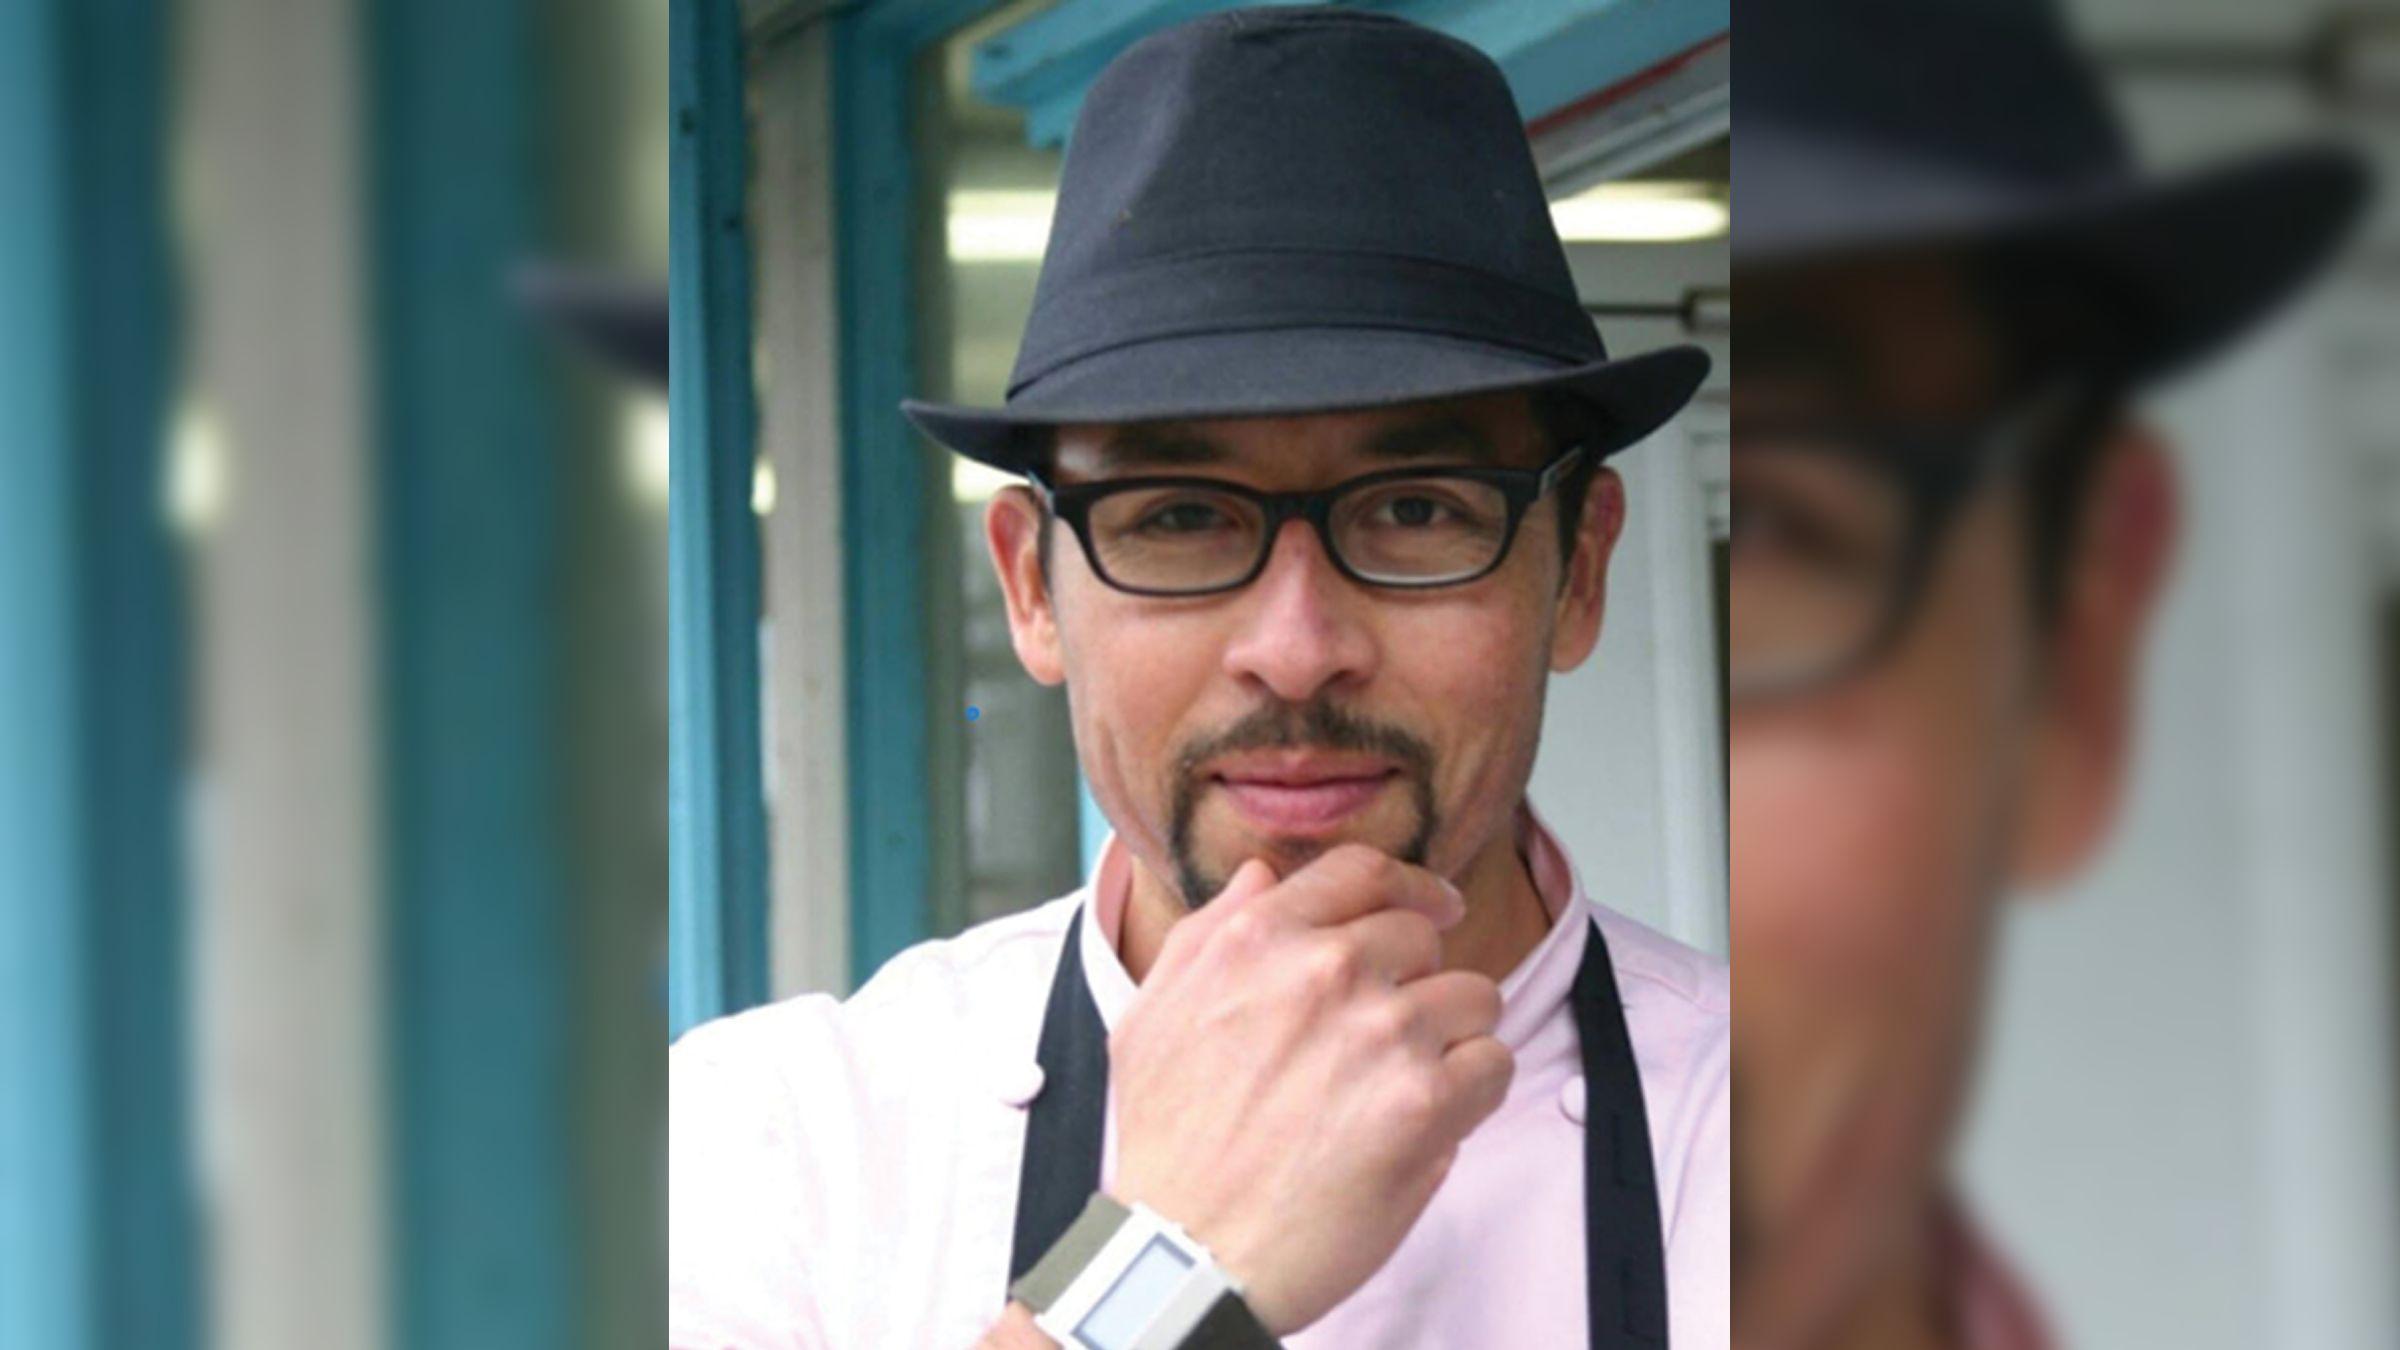 Getting to Know Chef Francisco Alejandri Vazquez